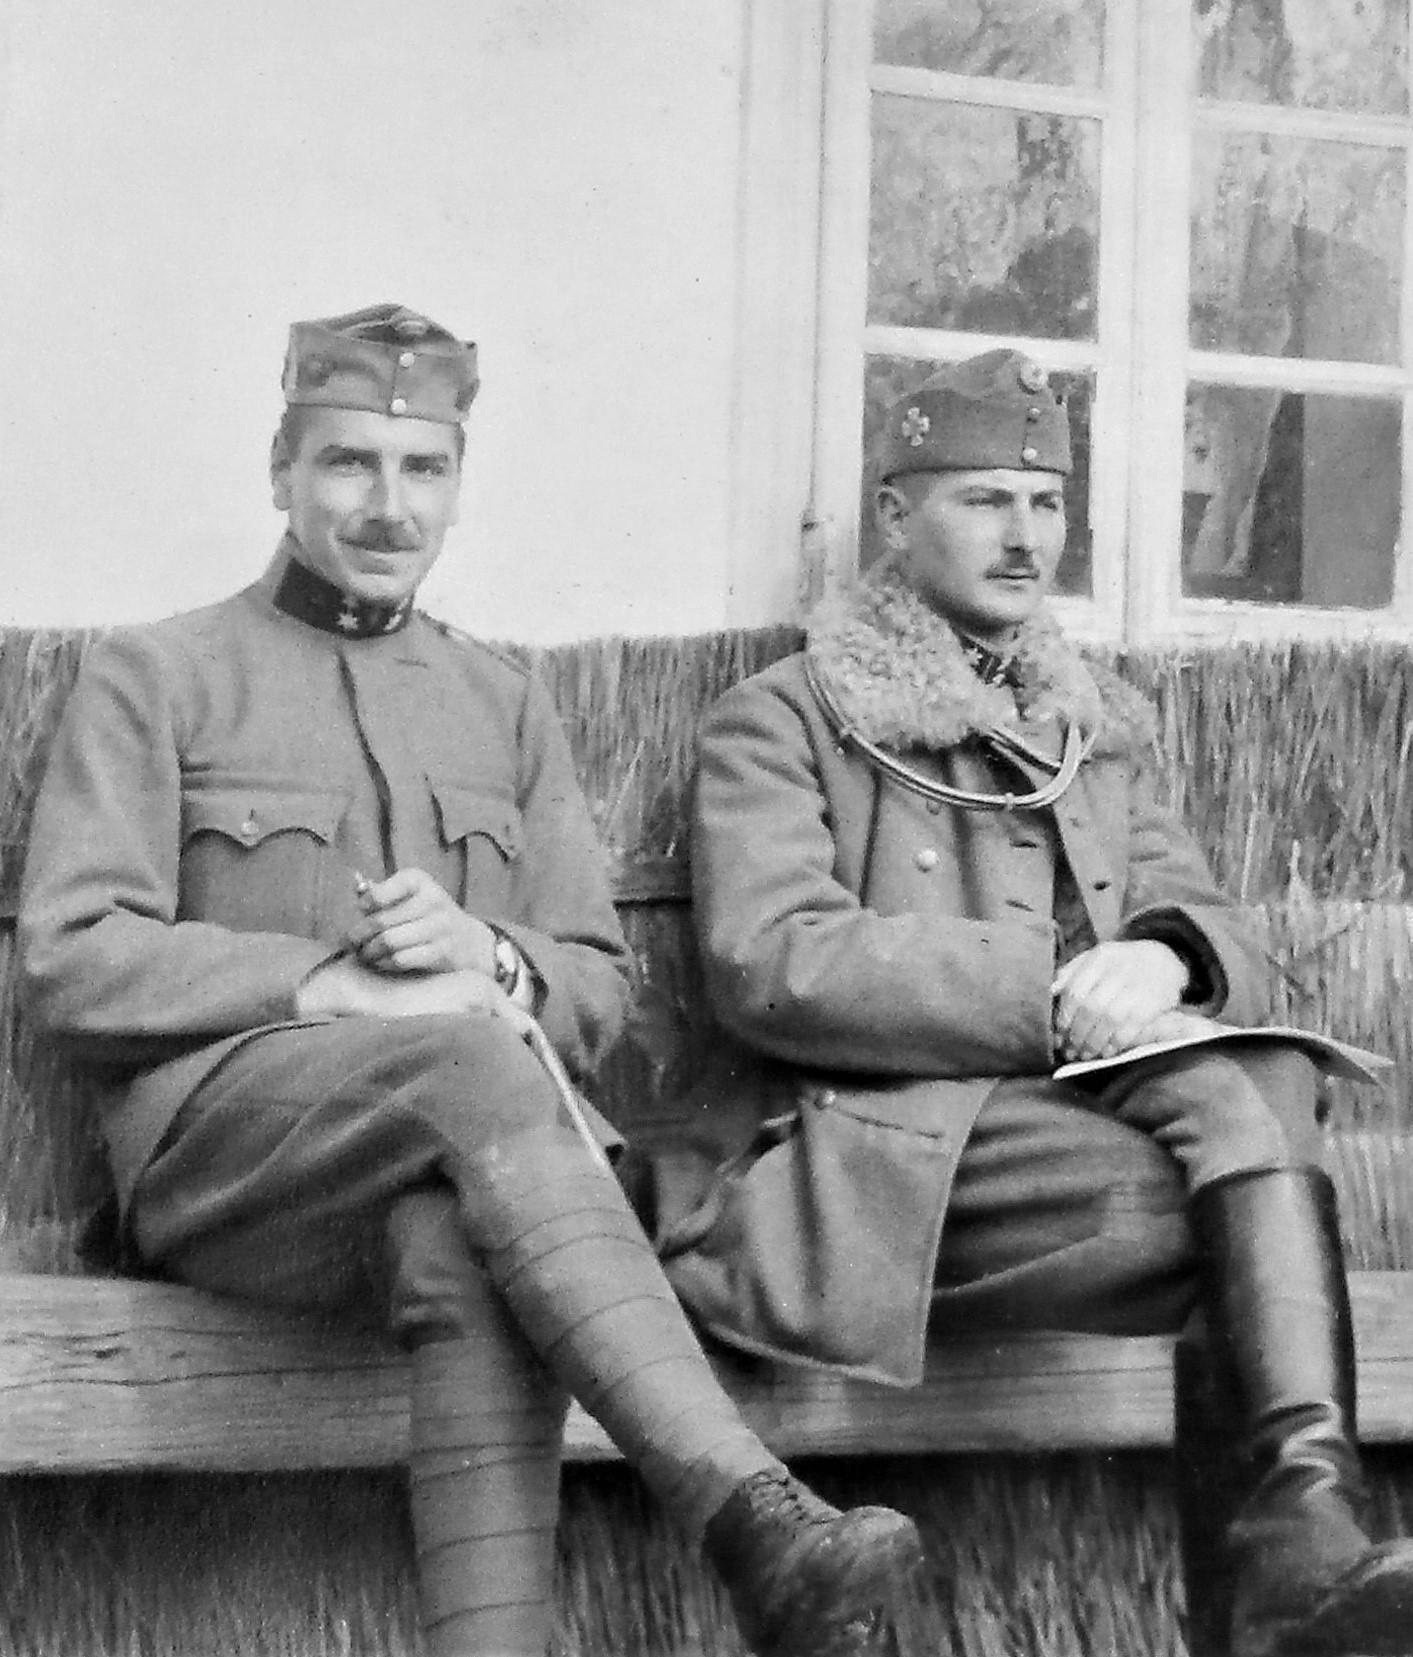 Mit Oblt Penka, vor dem Messelokal, Frühjahr 1916, Czernelica